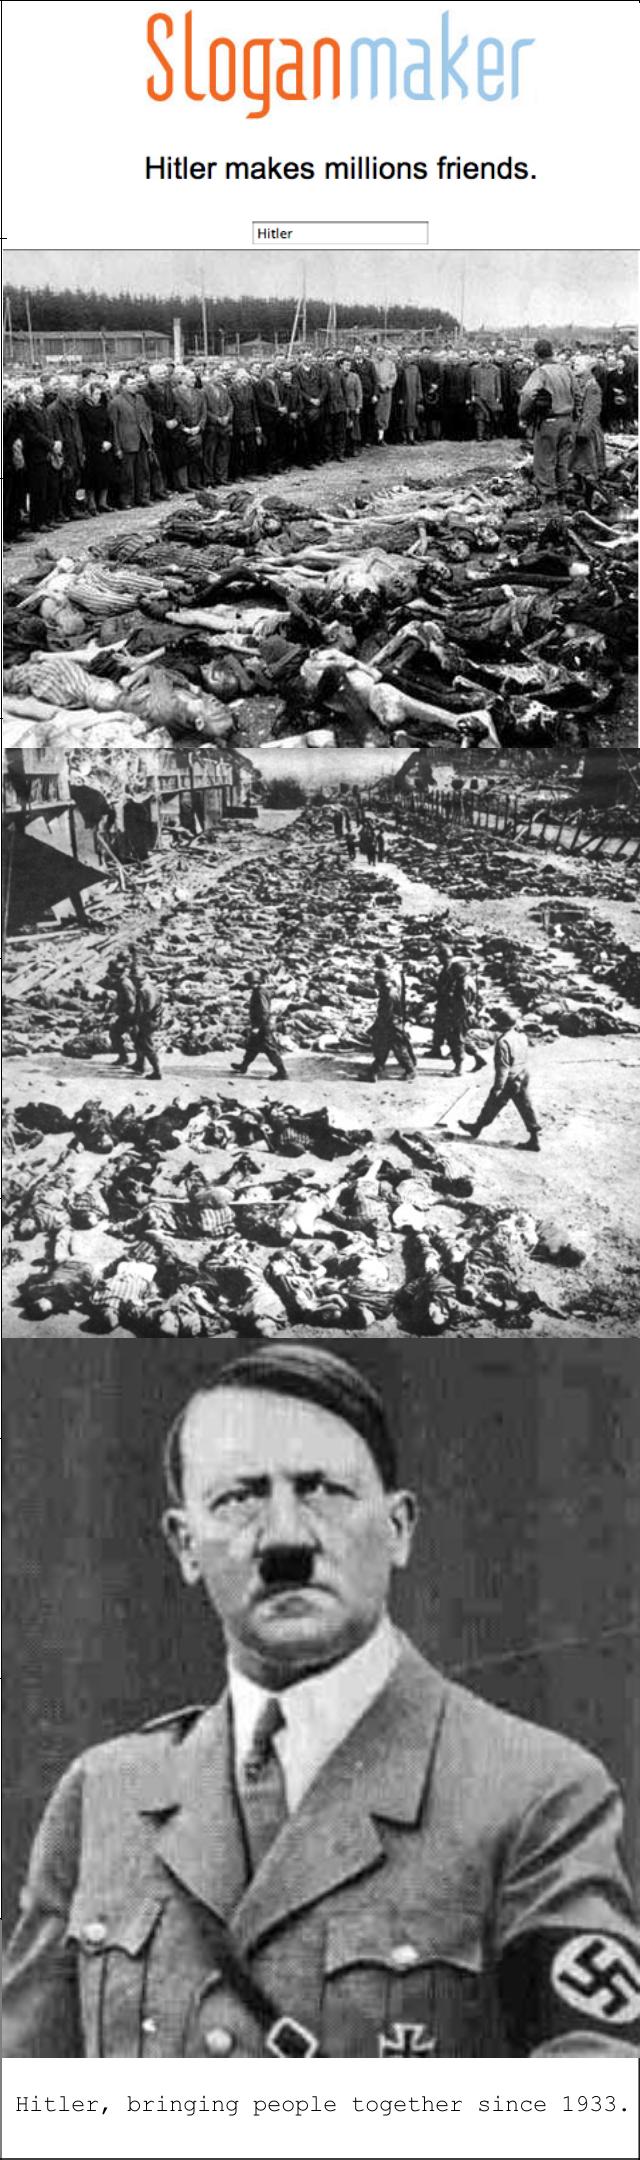 Hitler. OC as . bringing since 1933. Hitler, Hitler fucks bitches